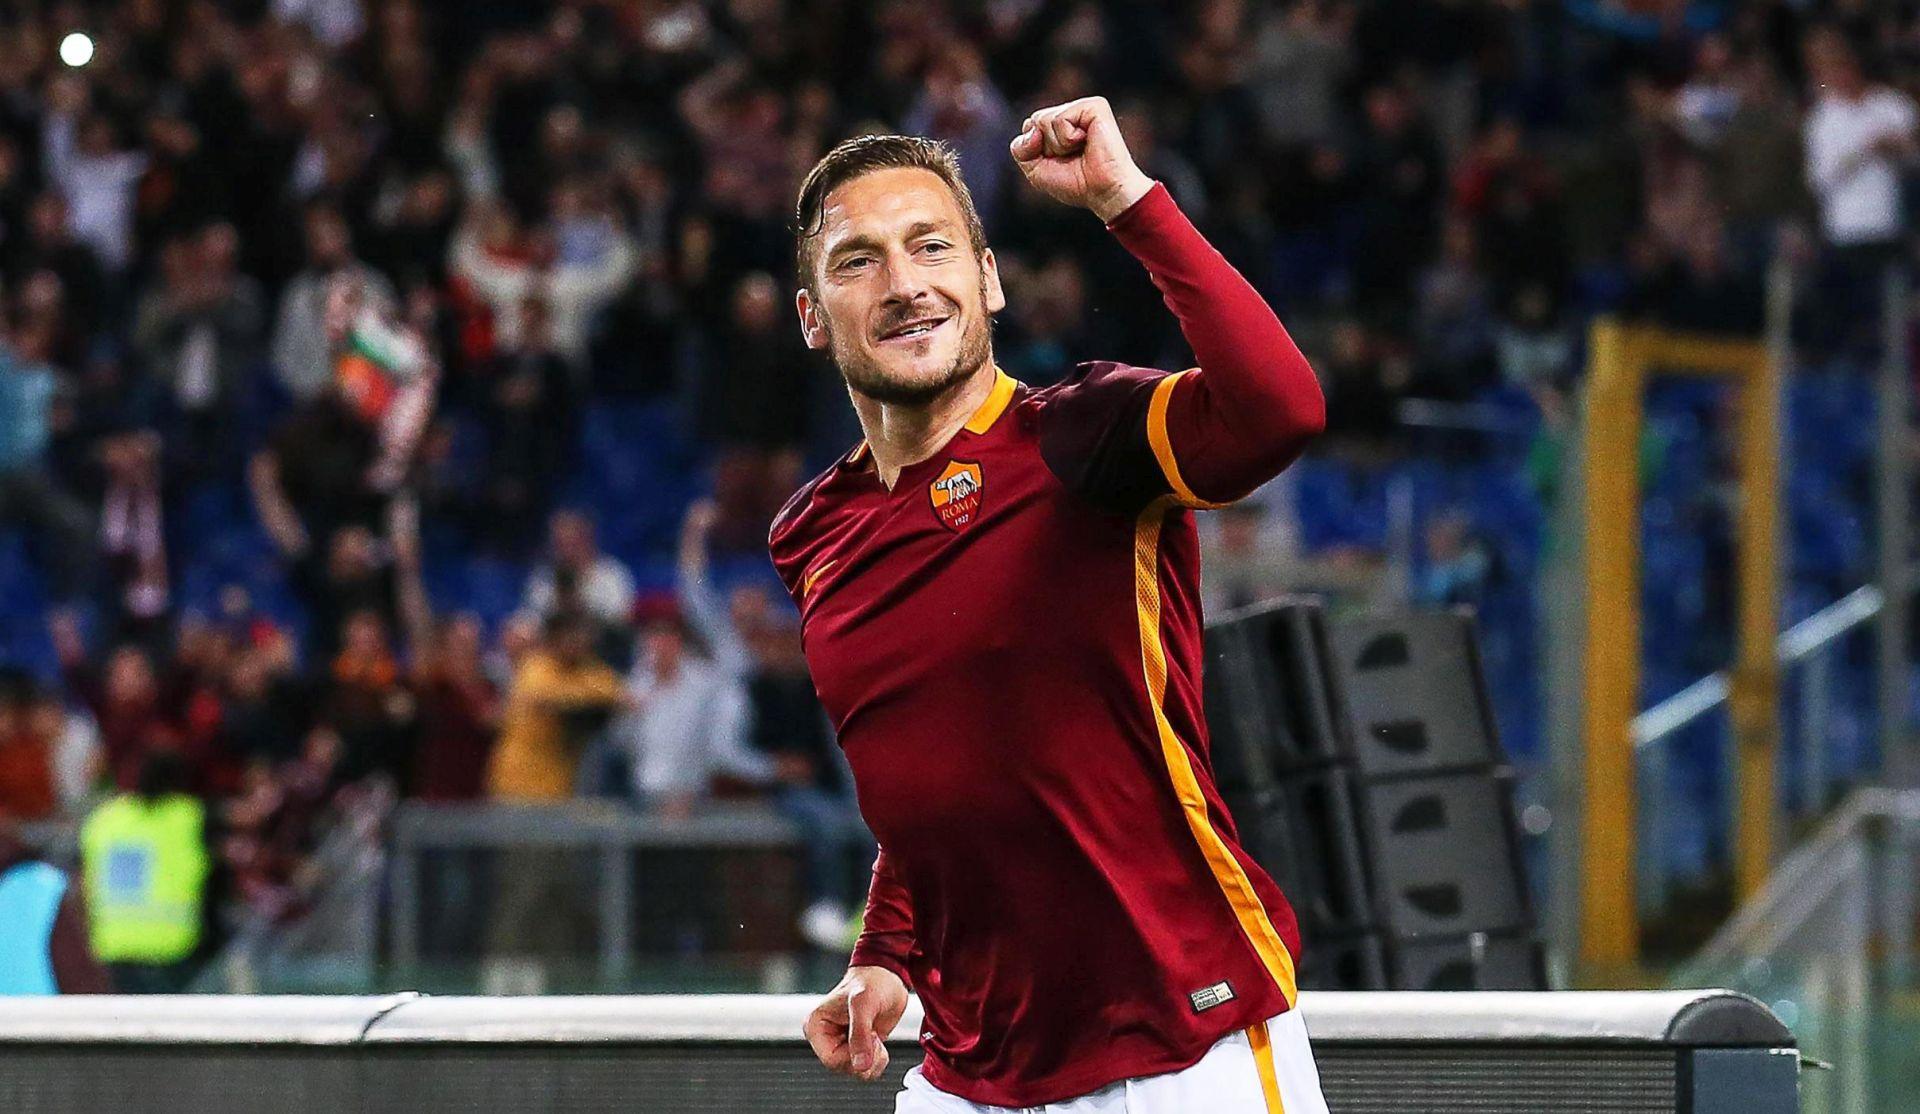 TALIJANSKI KUP Francesco Totti Romi donio polufinale u 97. minuti